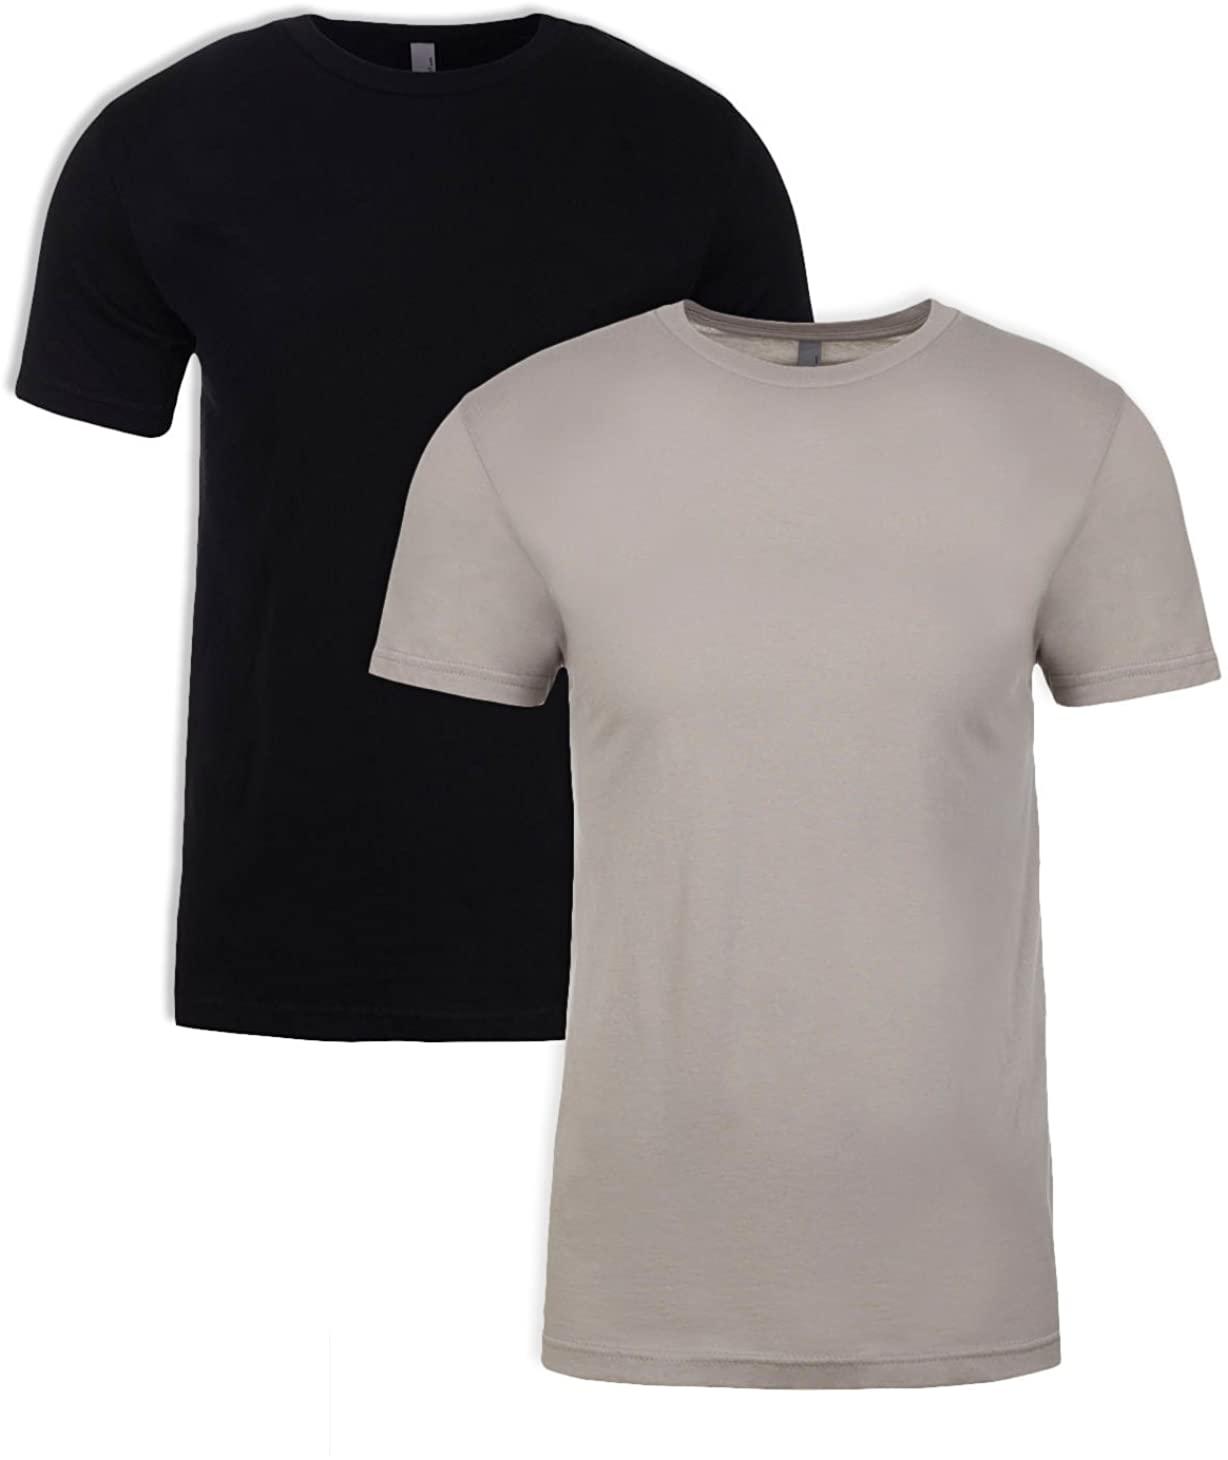 Next Level N6210 T-Shirt, Black + Silk (2 Pack), XX-Large